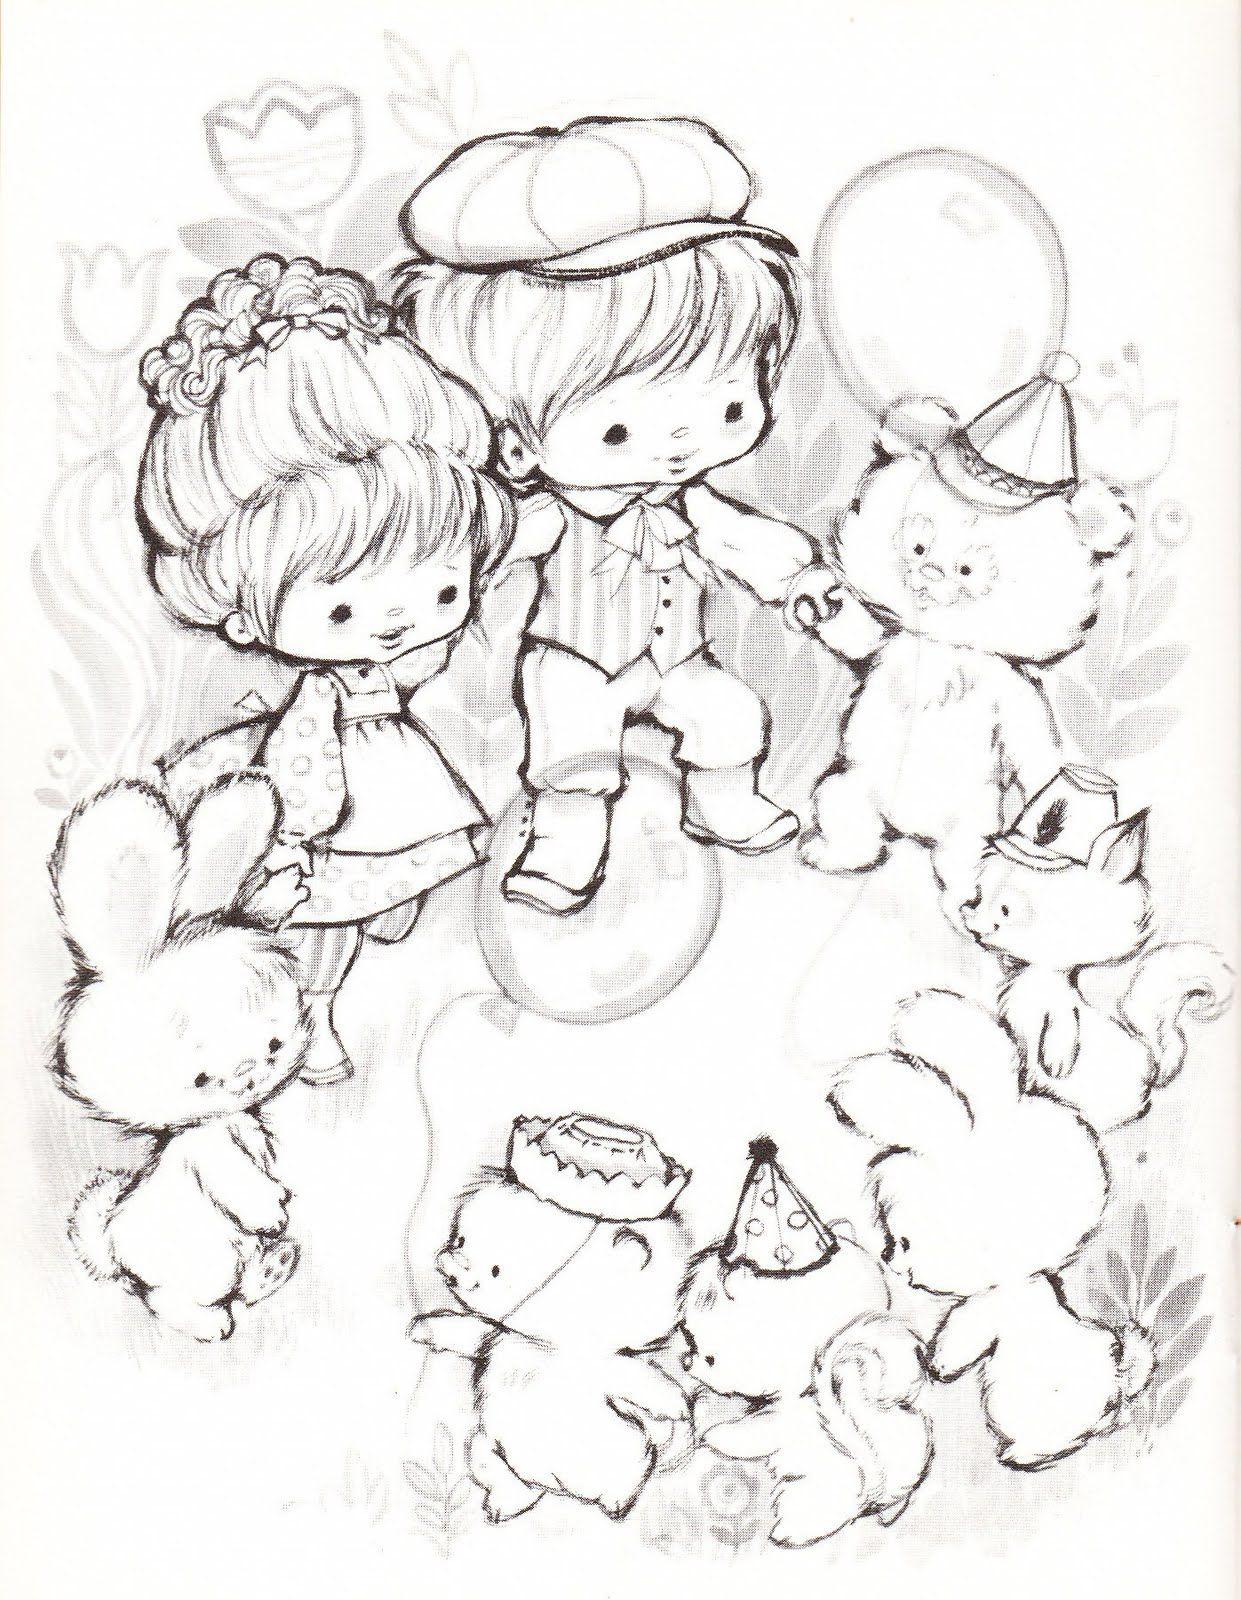 Charming+desenhos+para+colorir+%2830%29.jpg (1241×1600) | personas ...